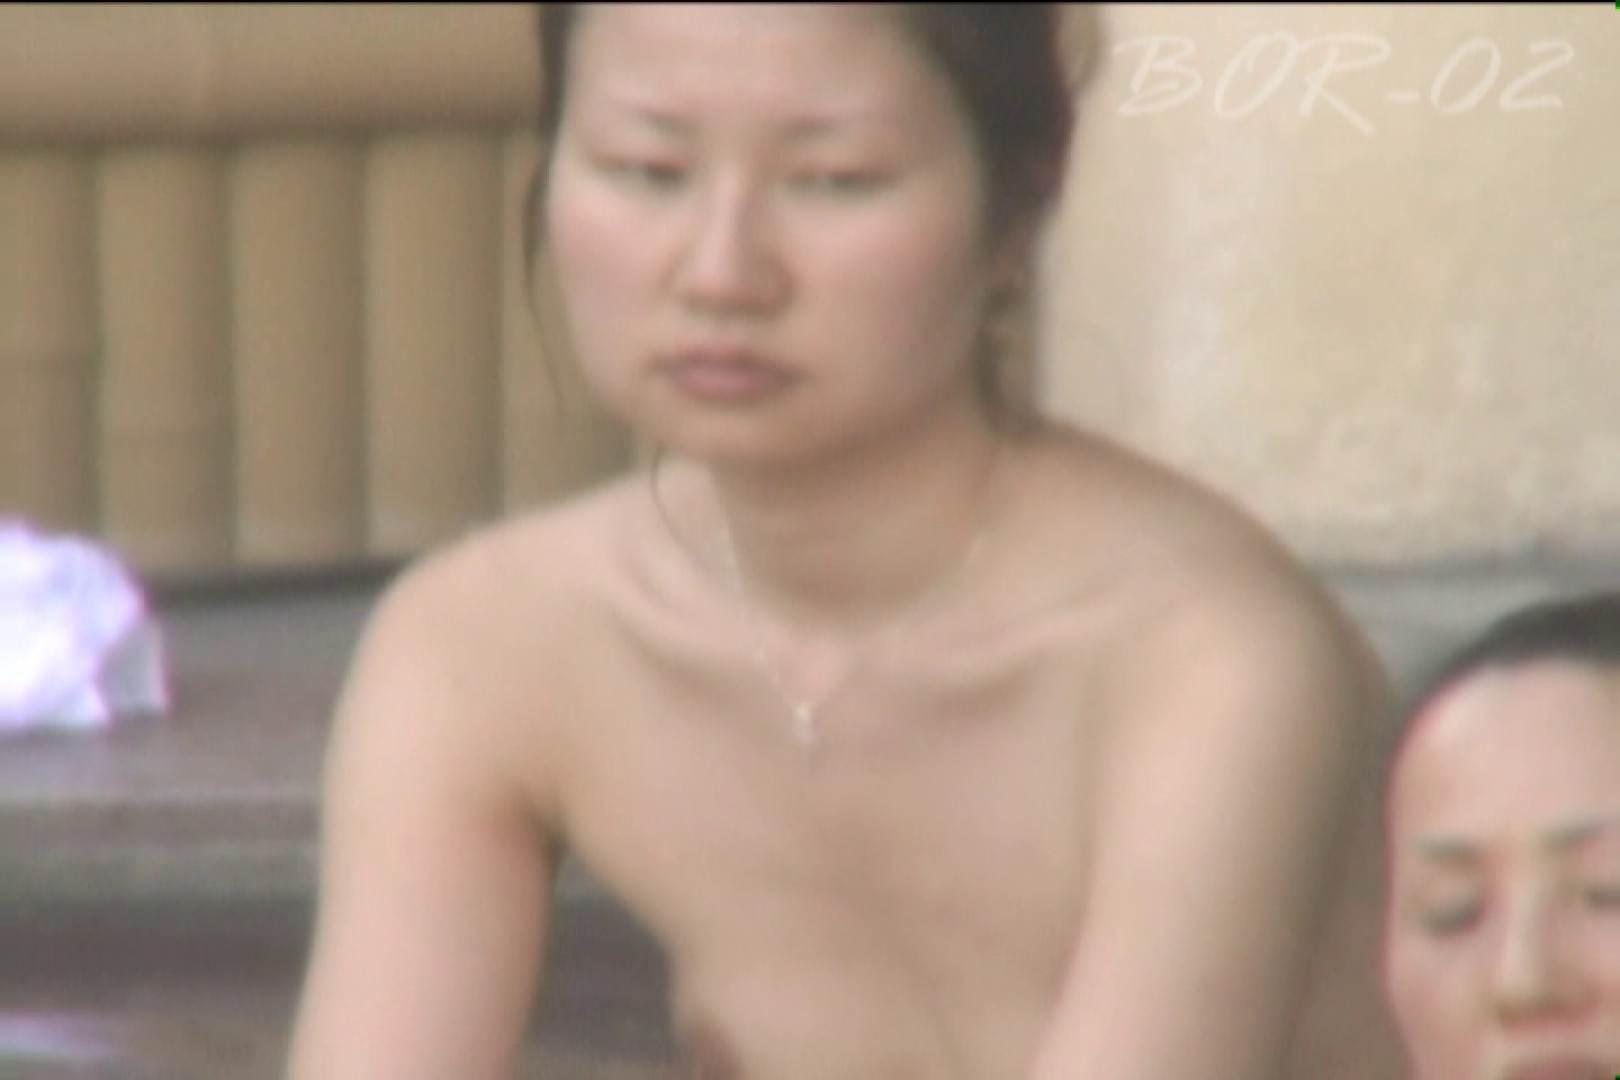 Aquaな露天風呂Vol.477 露天 アダルト動画キャプチャ 99PICs 95